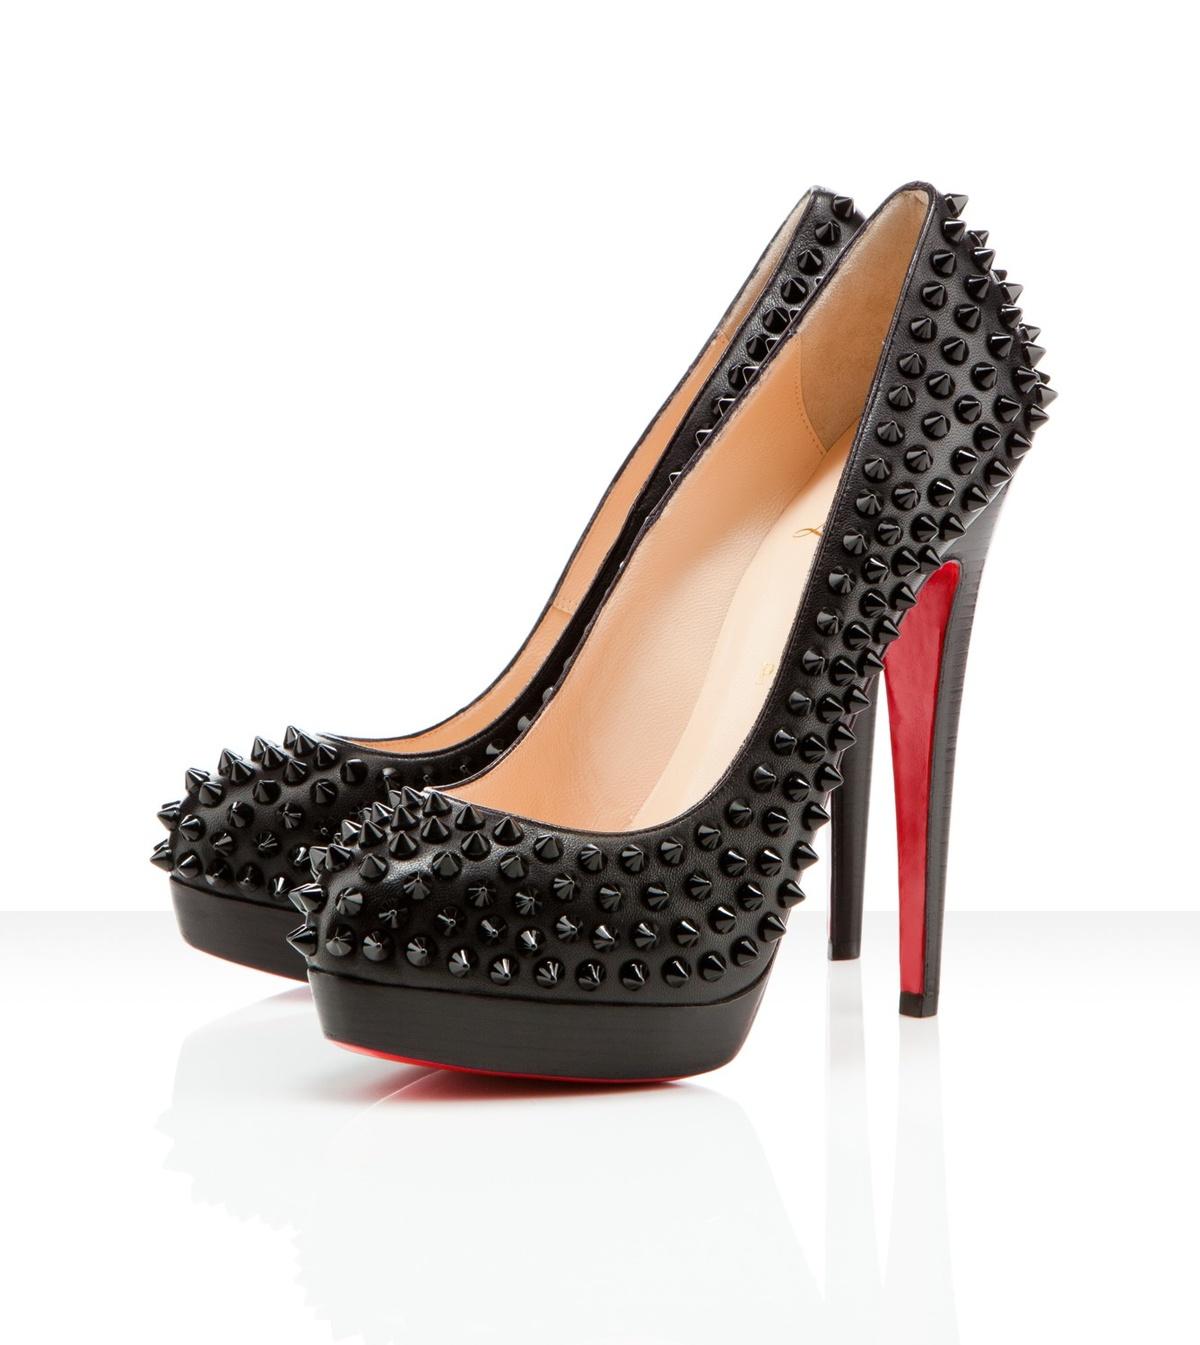 christian-louboutin-christian-louboutin-sale-christian-louboutin-shoes-louboutin-outlet-shoes-outlet-Favim.com-259152